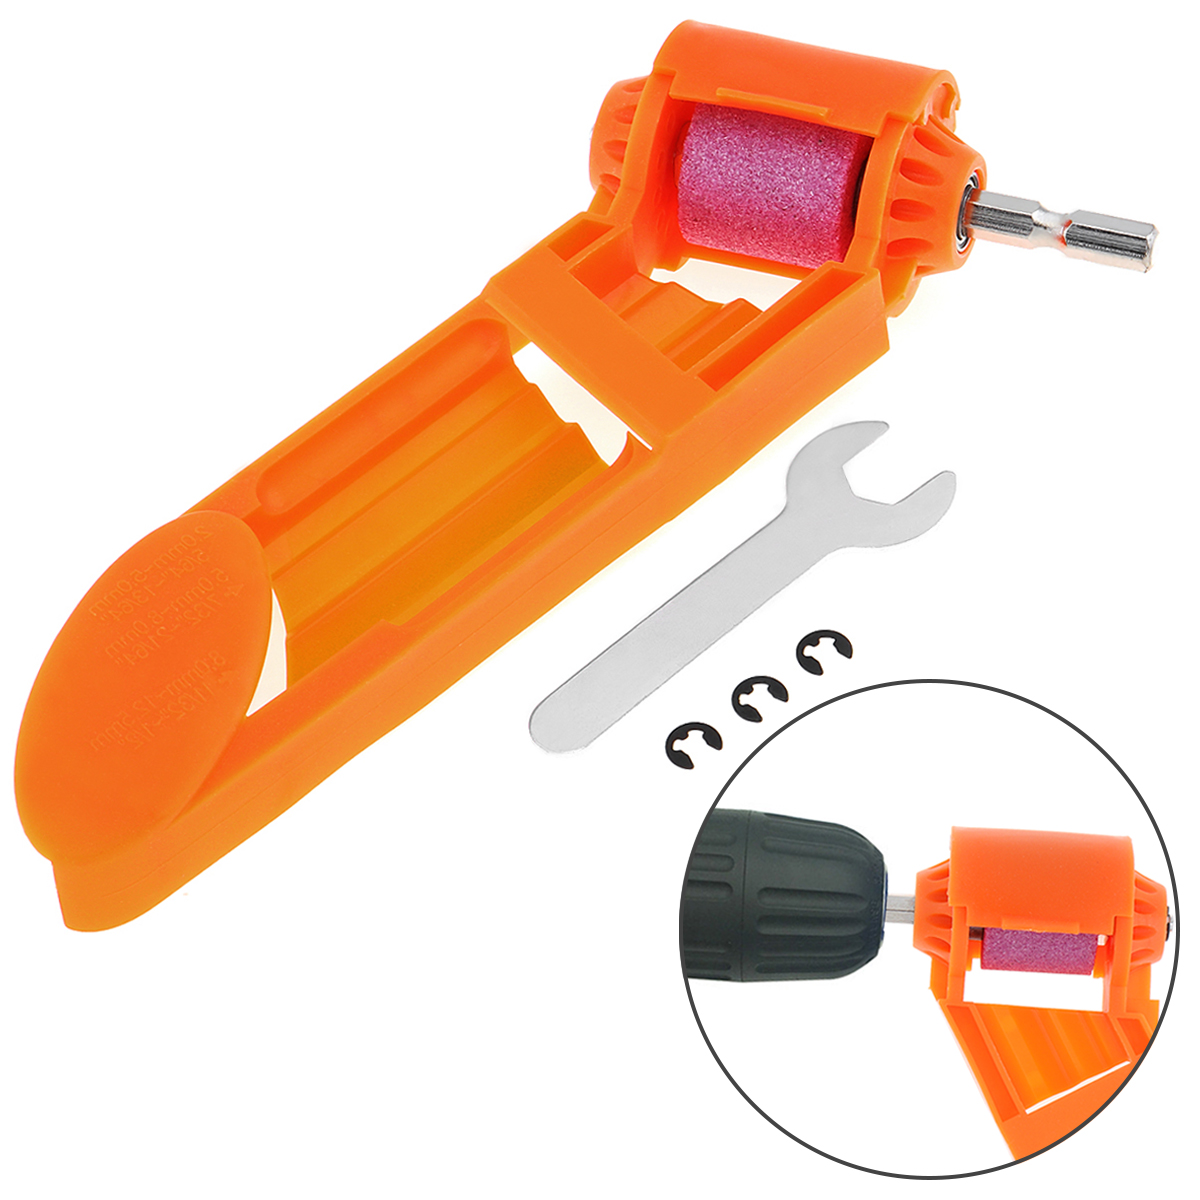 2-12.5mm Drill Bit Sharpener Portable Corundum Grinding Wheel Tool With Buckle For Polishing Drill Bit Sharpener